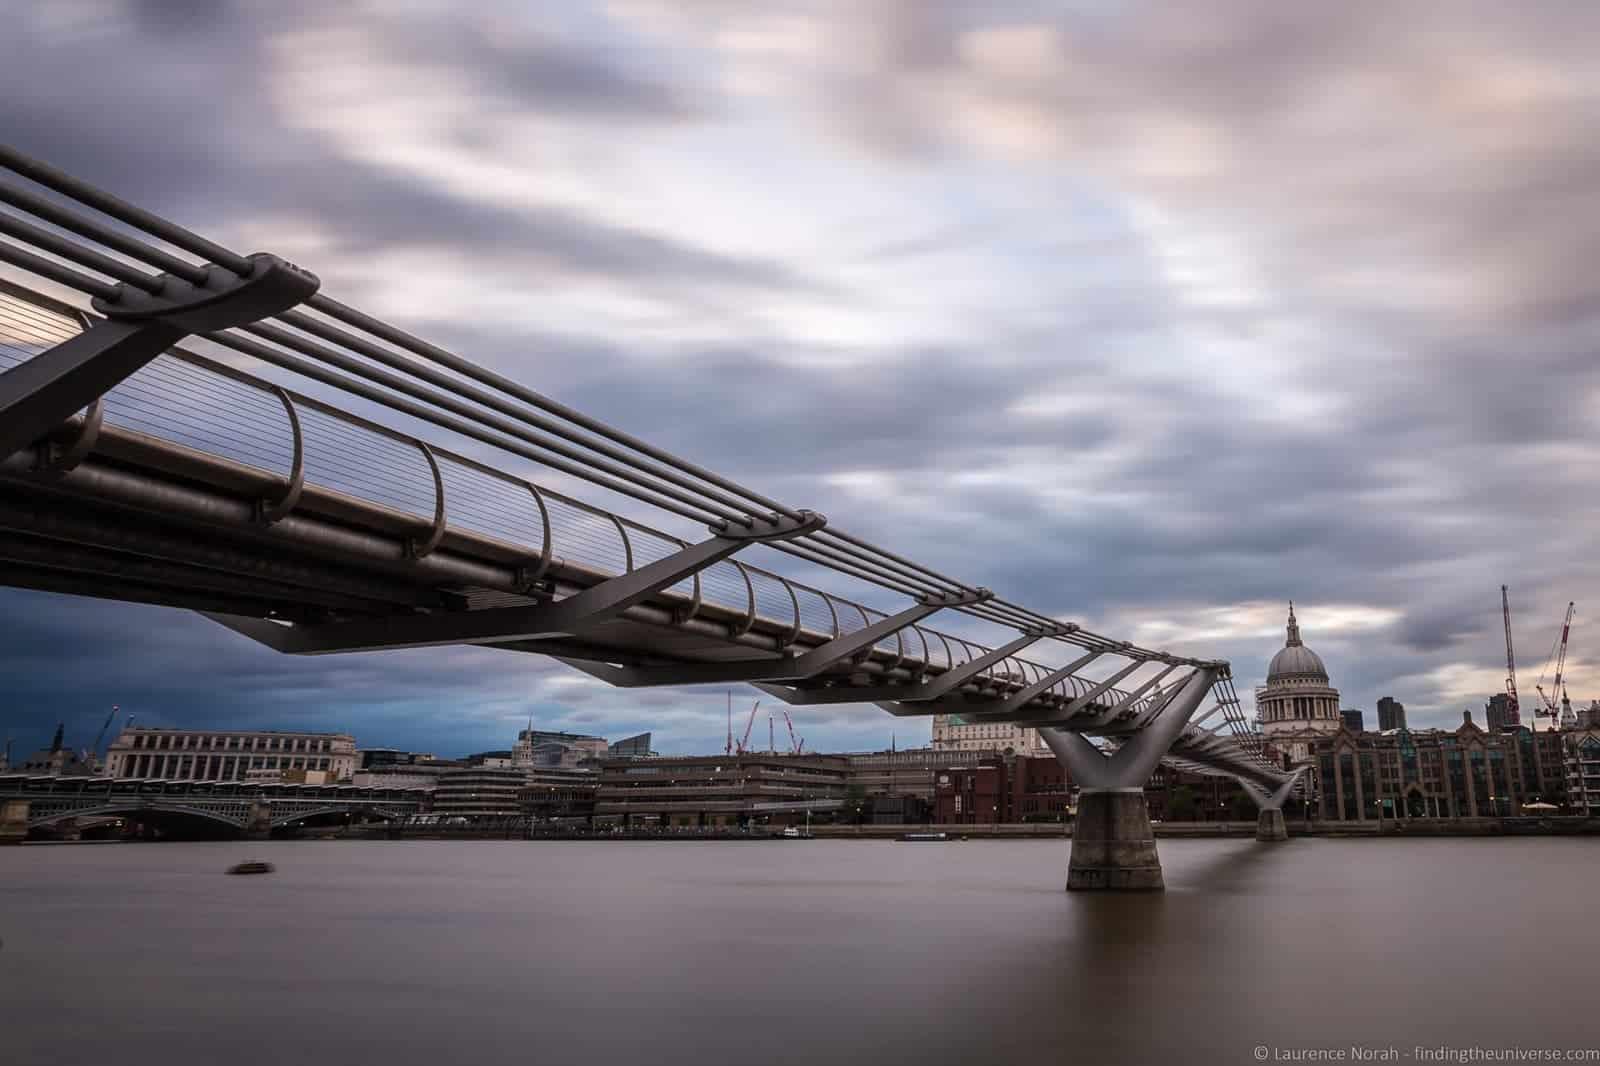 A photo of the Millennium Bridge in London.